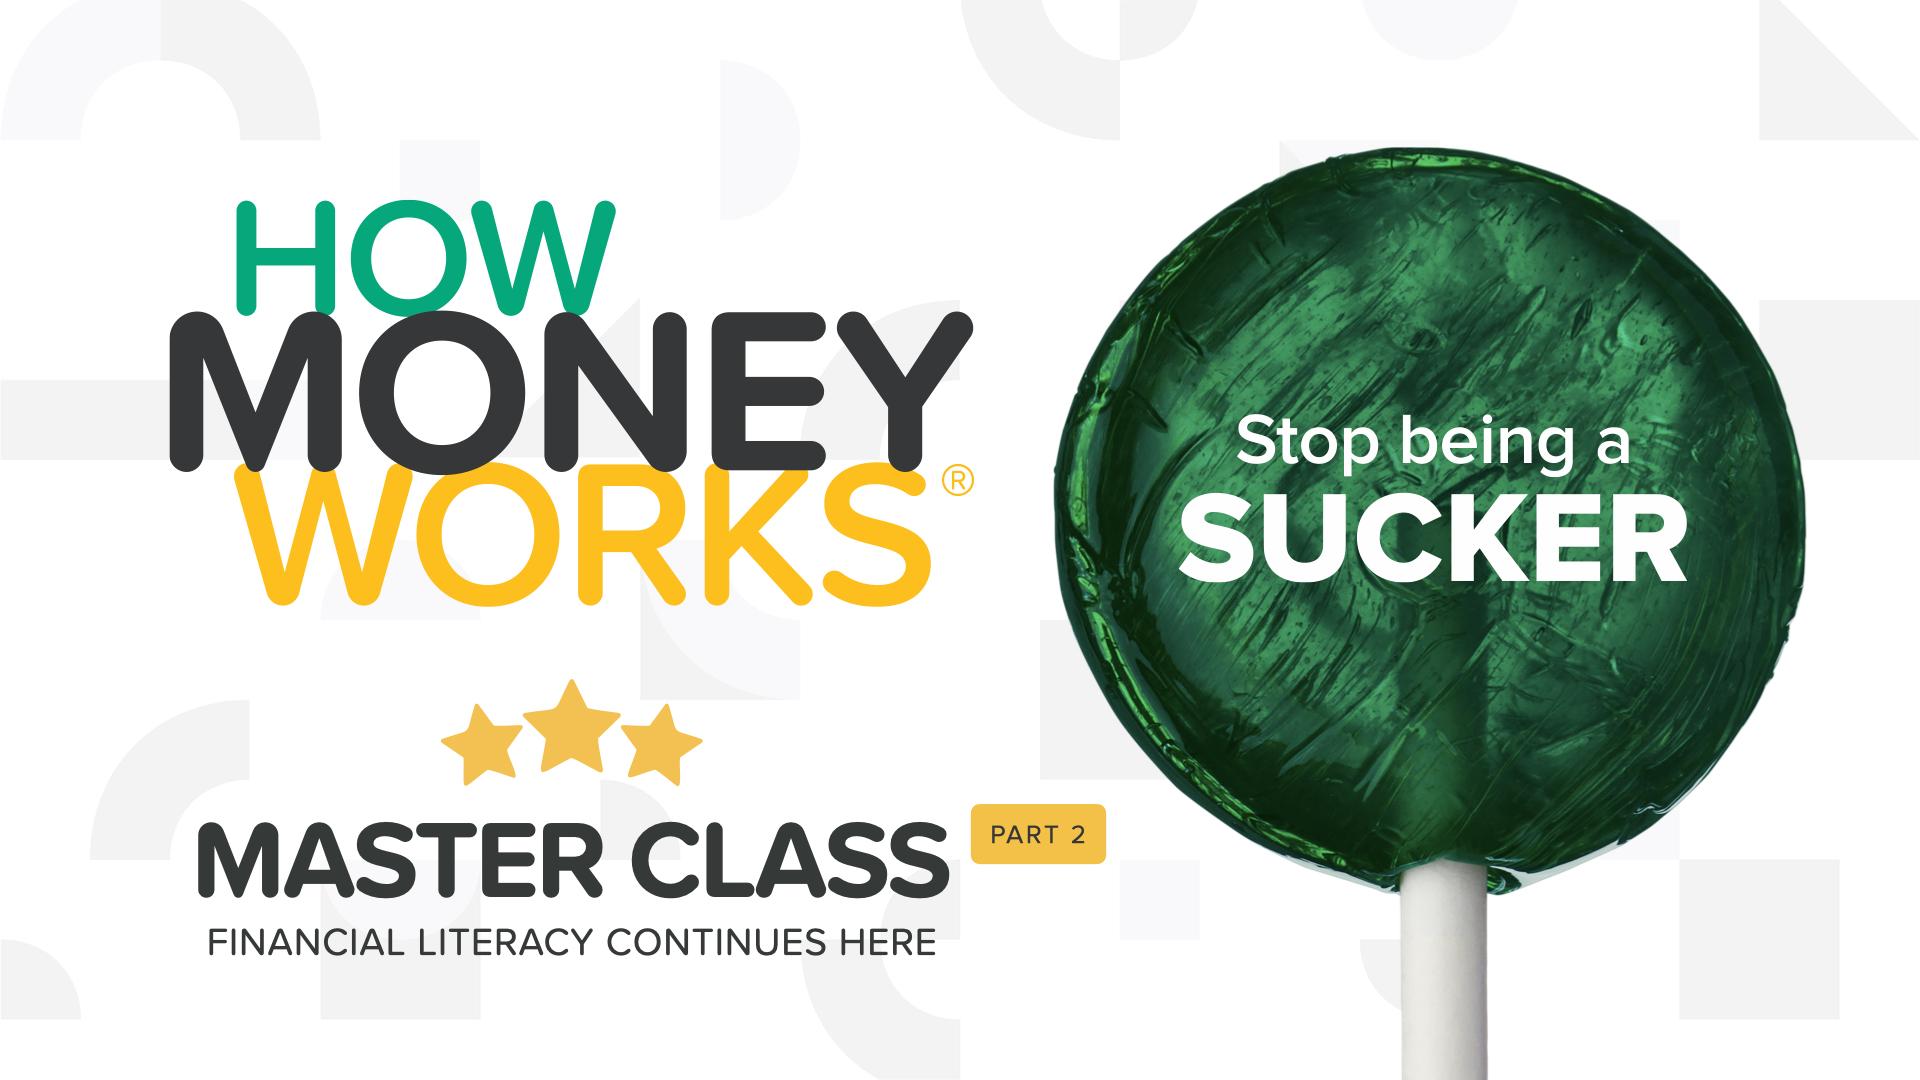 HowMoneyWorks Master Class - Part 2